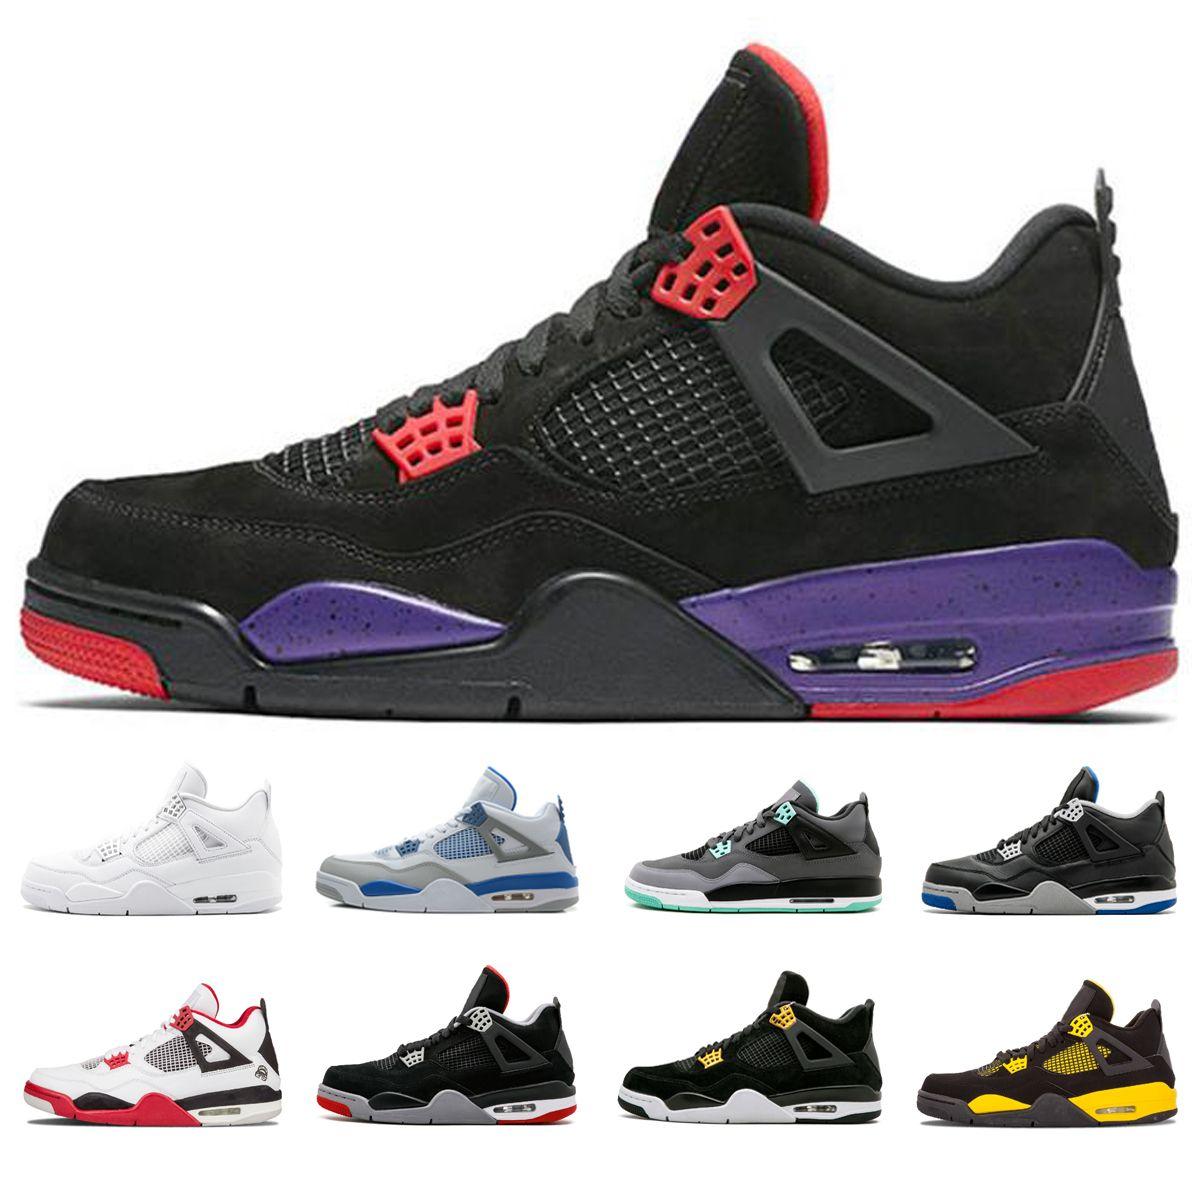 uk availability e9bb3 aa9b4 4 4s Men Basketball Shoes Hot Raptors Pure Money Royalty Black Cat Green  Glow Raptors oreo Thunder 2019 mens Outdoor Sport Sneaker Shoes